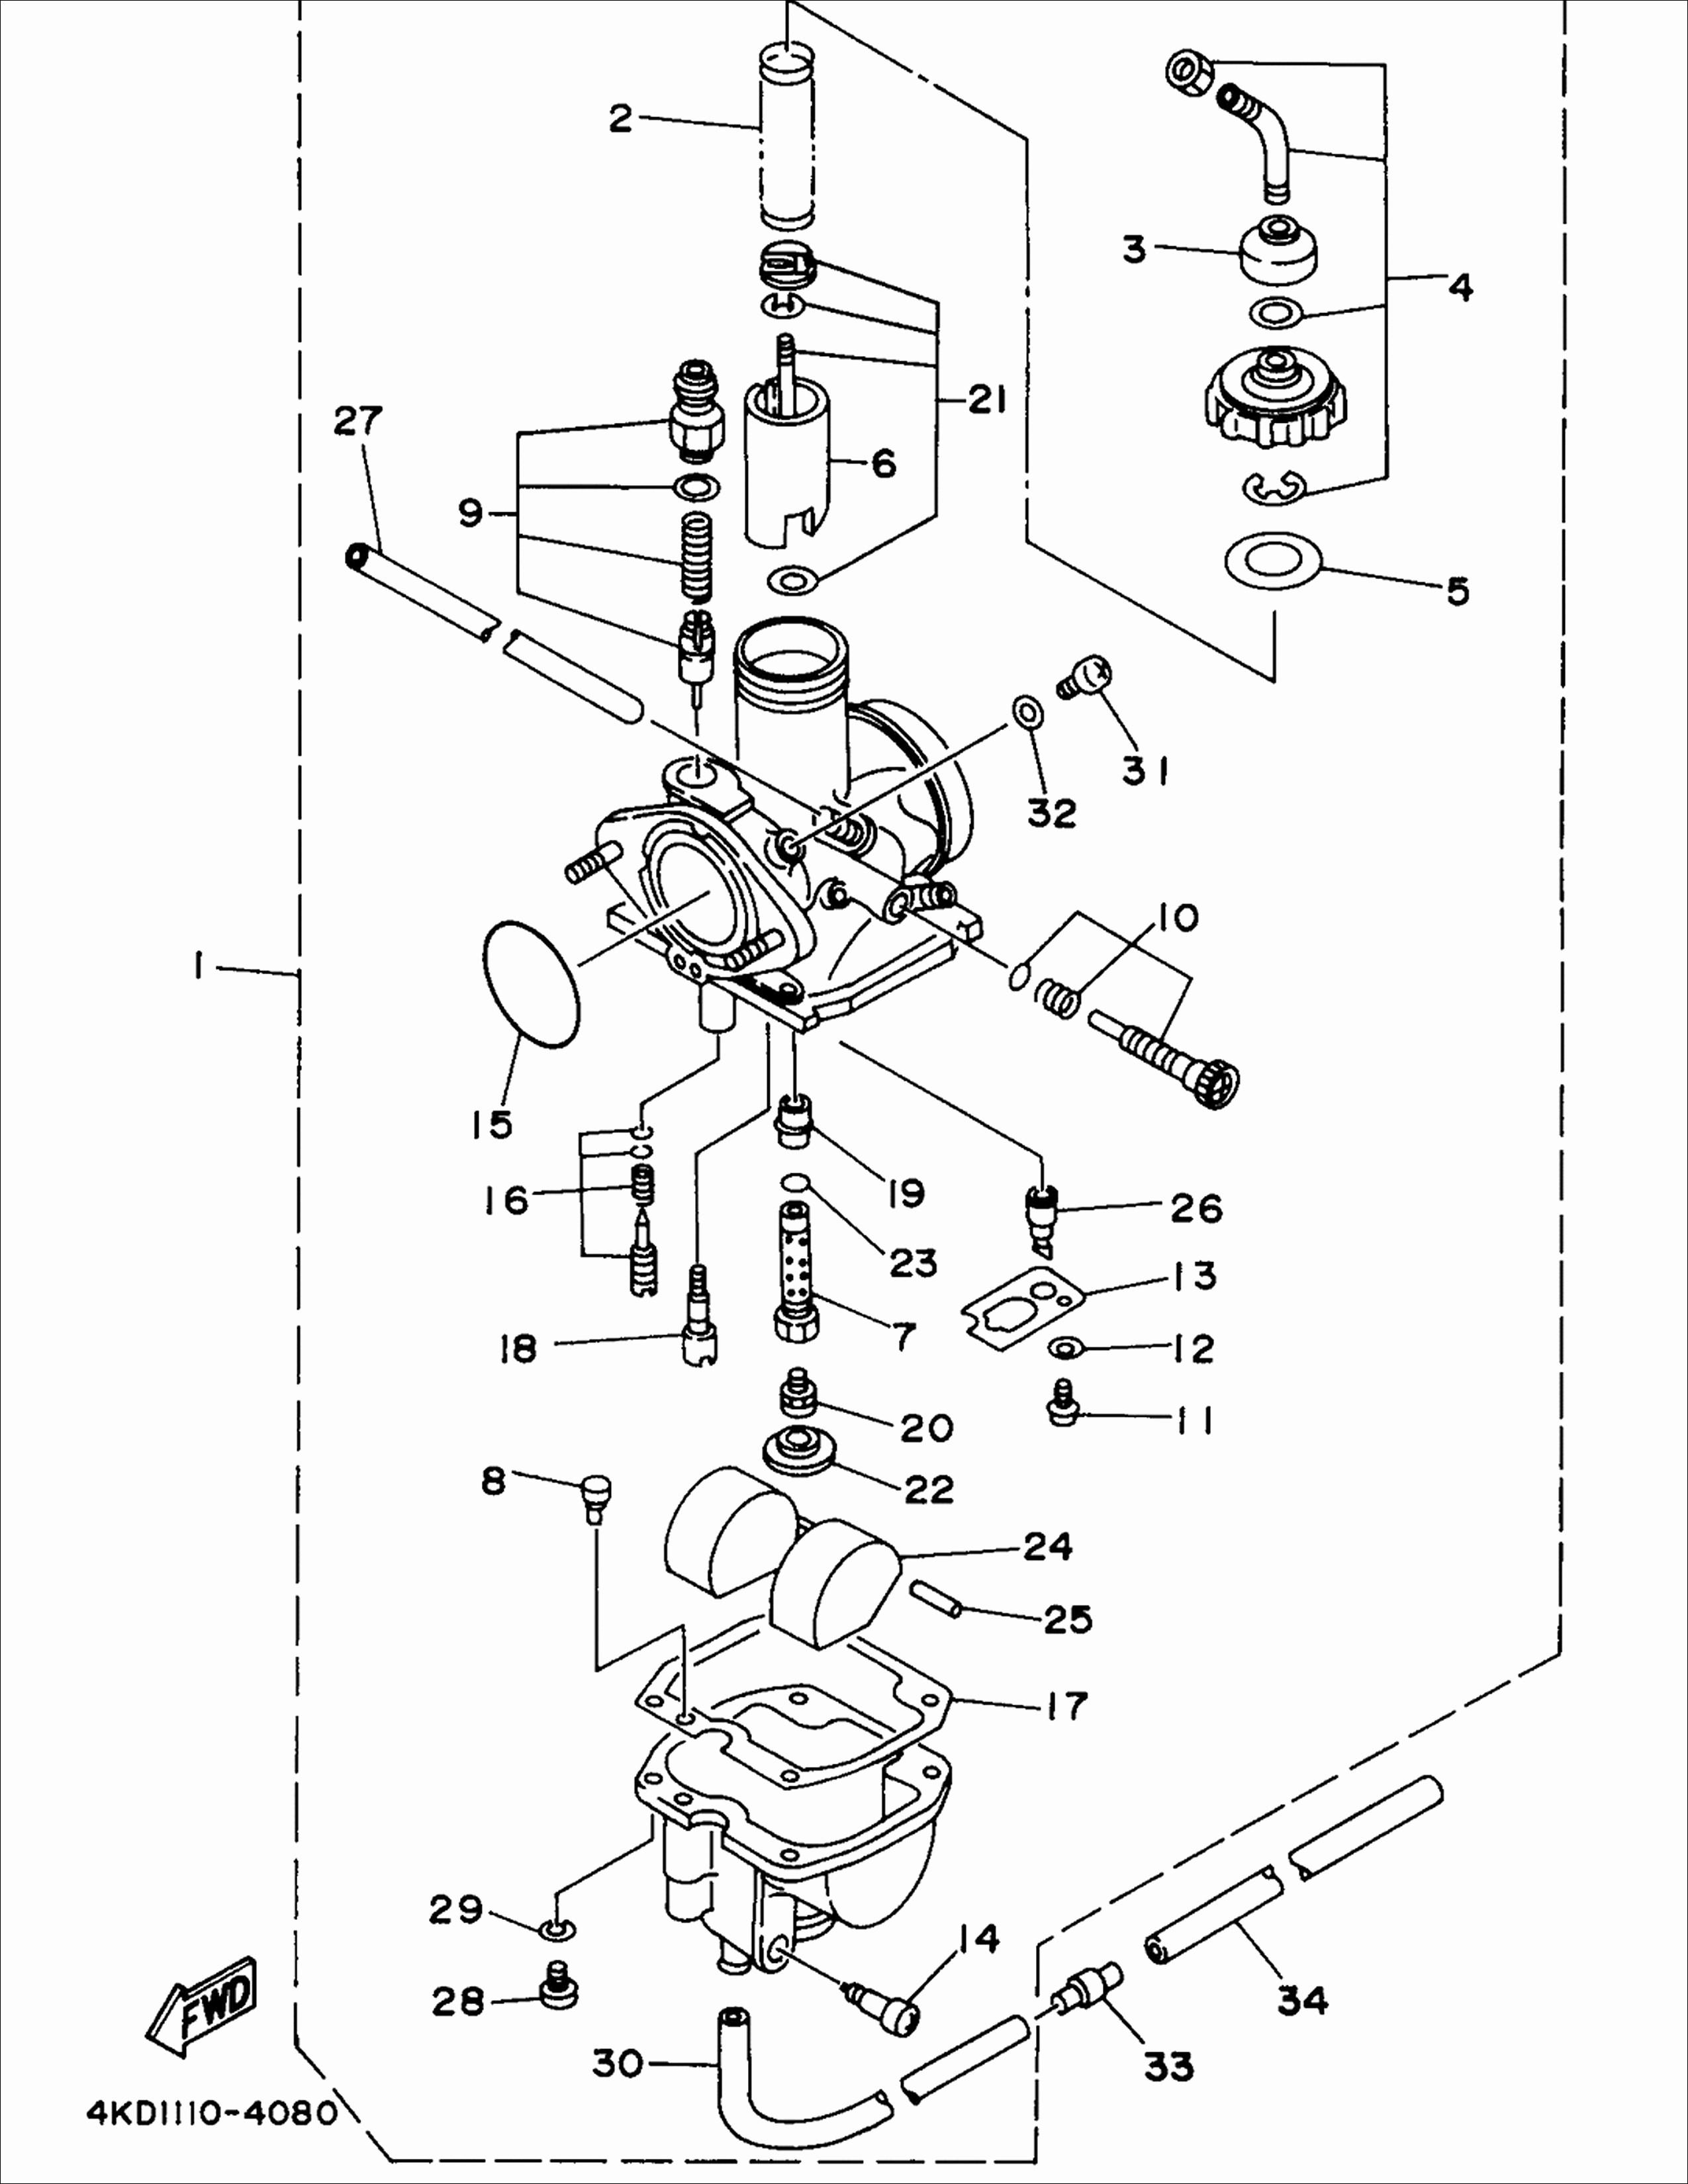 2000 ford ranger engine diagram jeep cj dash wiring explorer my